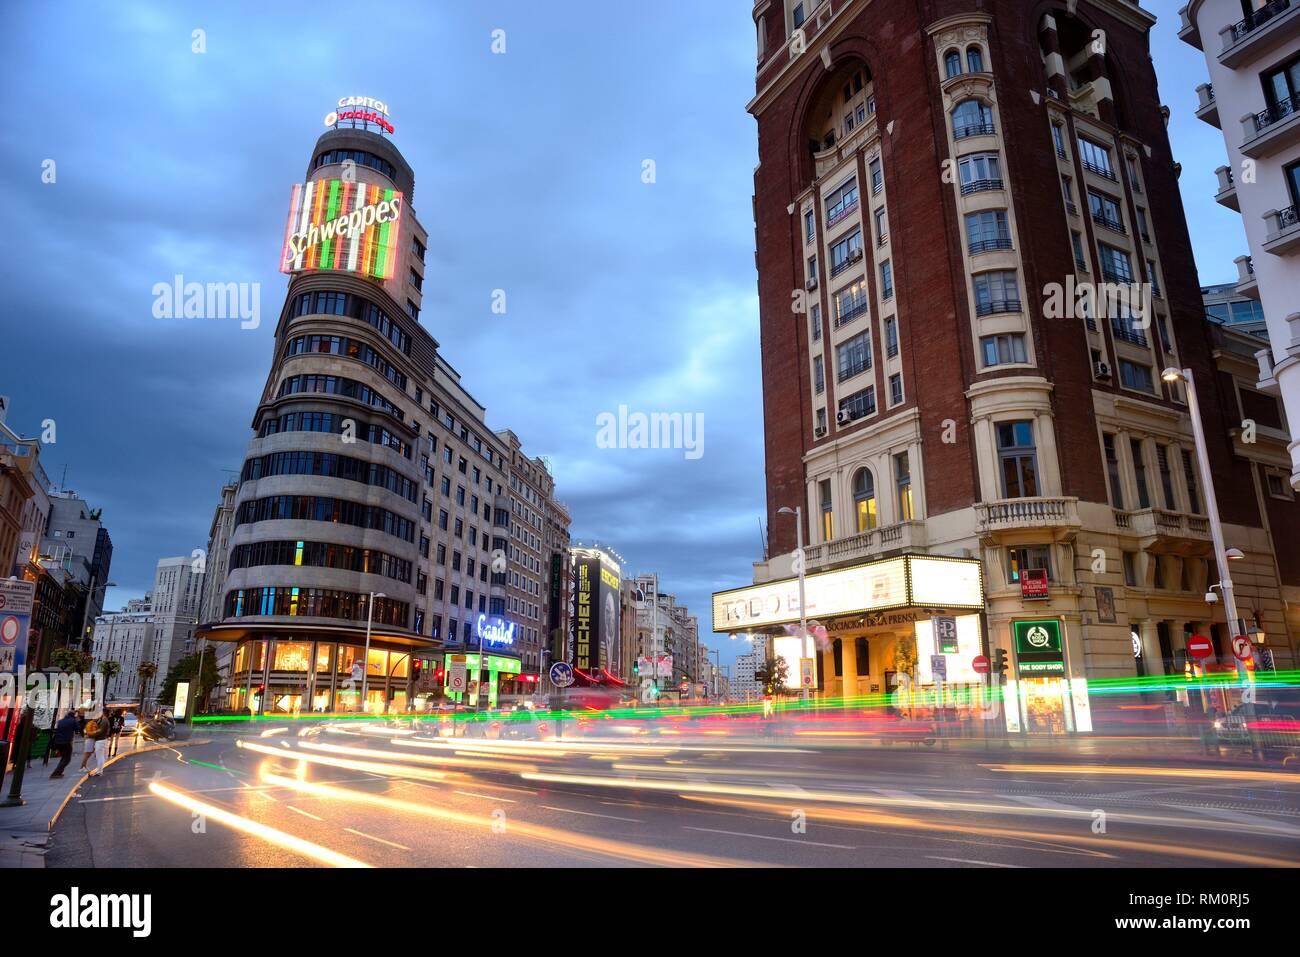 Gebäude in der Gran Via, Madrid, Spanien. Stockbild